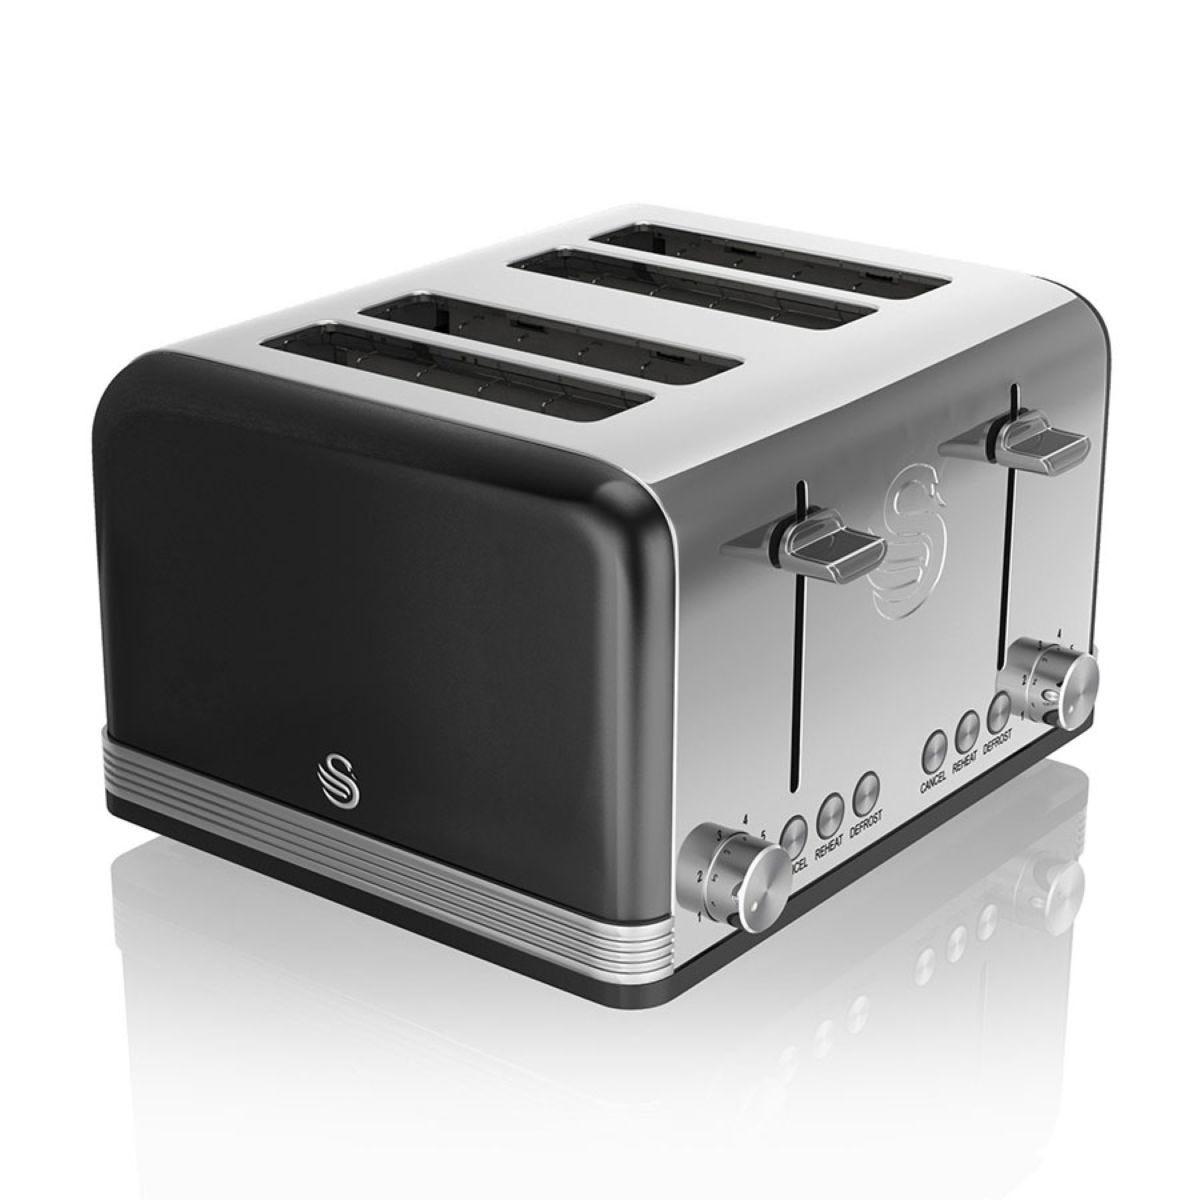 Swan ST19020BN 4-Slice Retro Toaster - Black